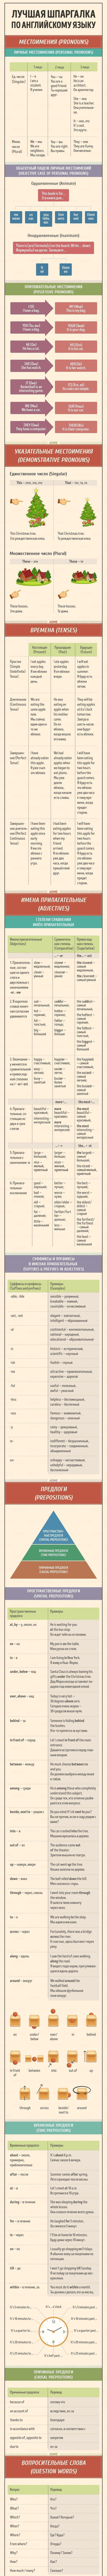 Лучшая шпаргалка по английскому языку http://www.adme.ru/svoboda-kultura/luchshaya-shpargalka-po-anglijskomu-yazyku-1145960/